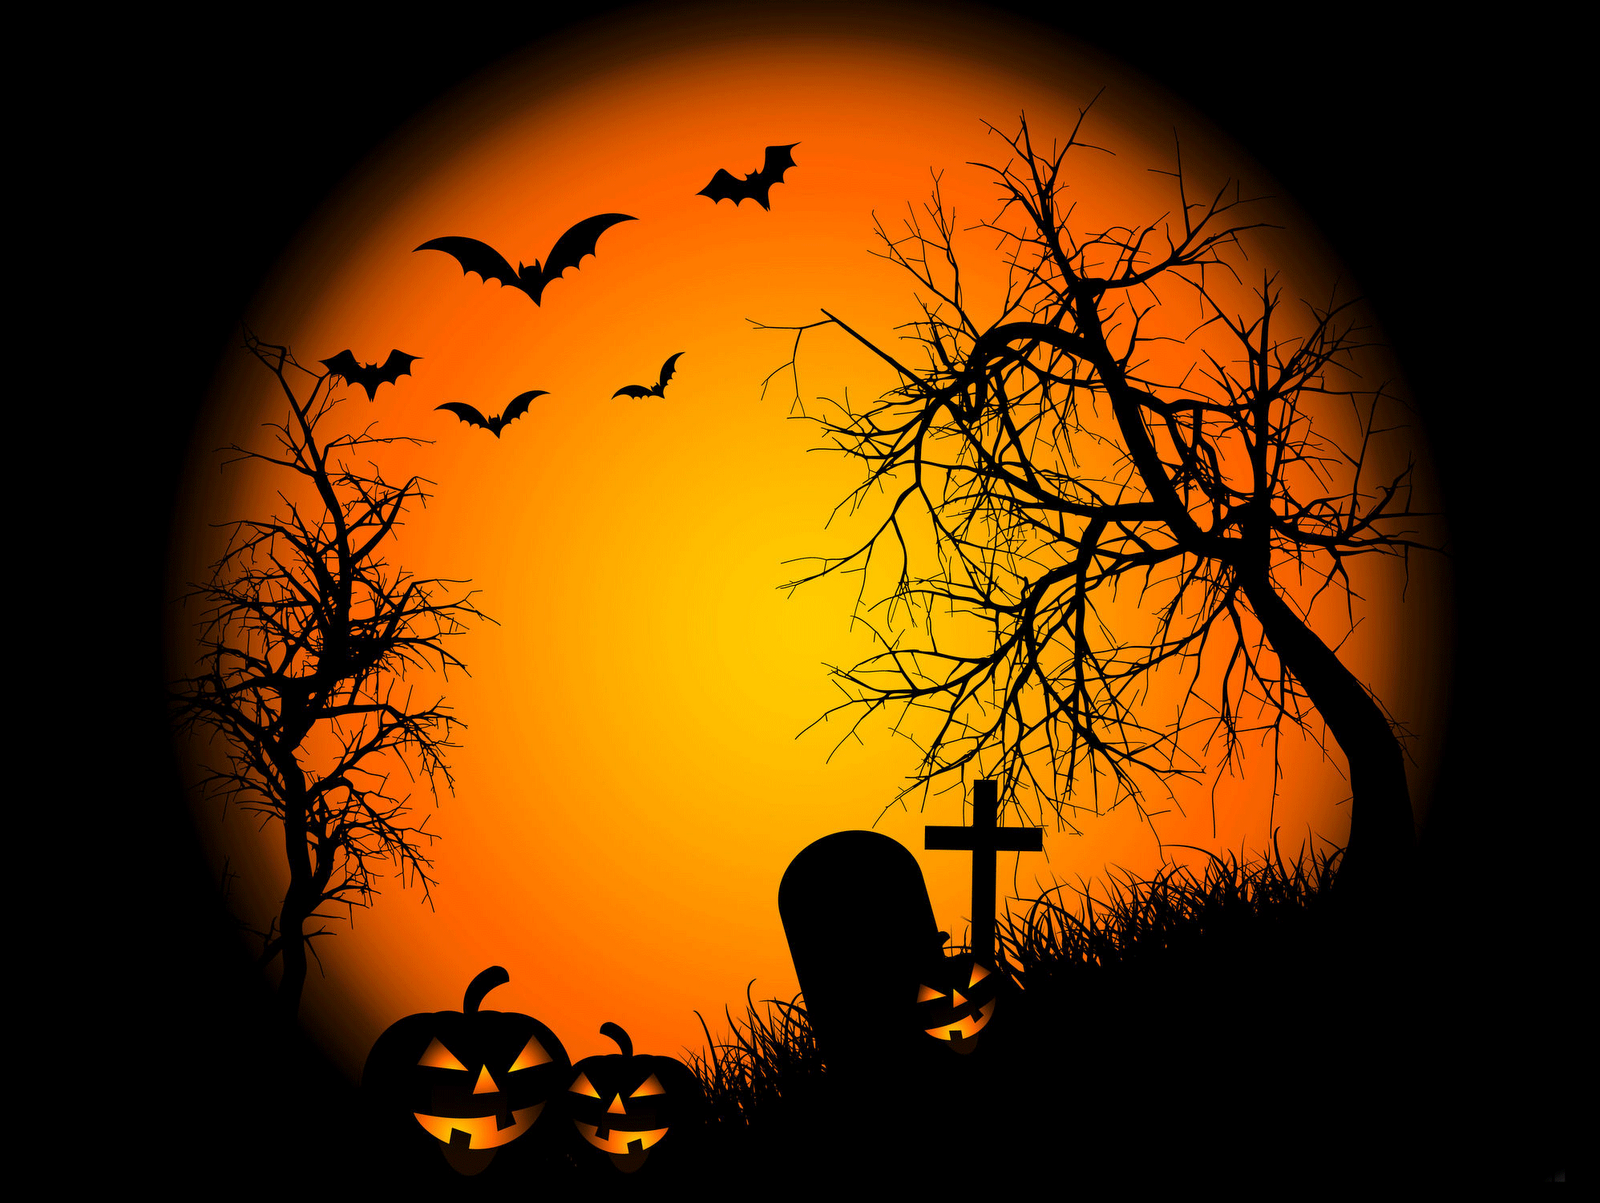 Happy Halloween Background Png